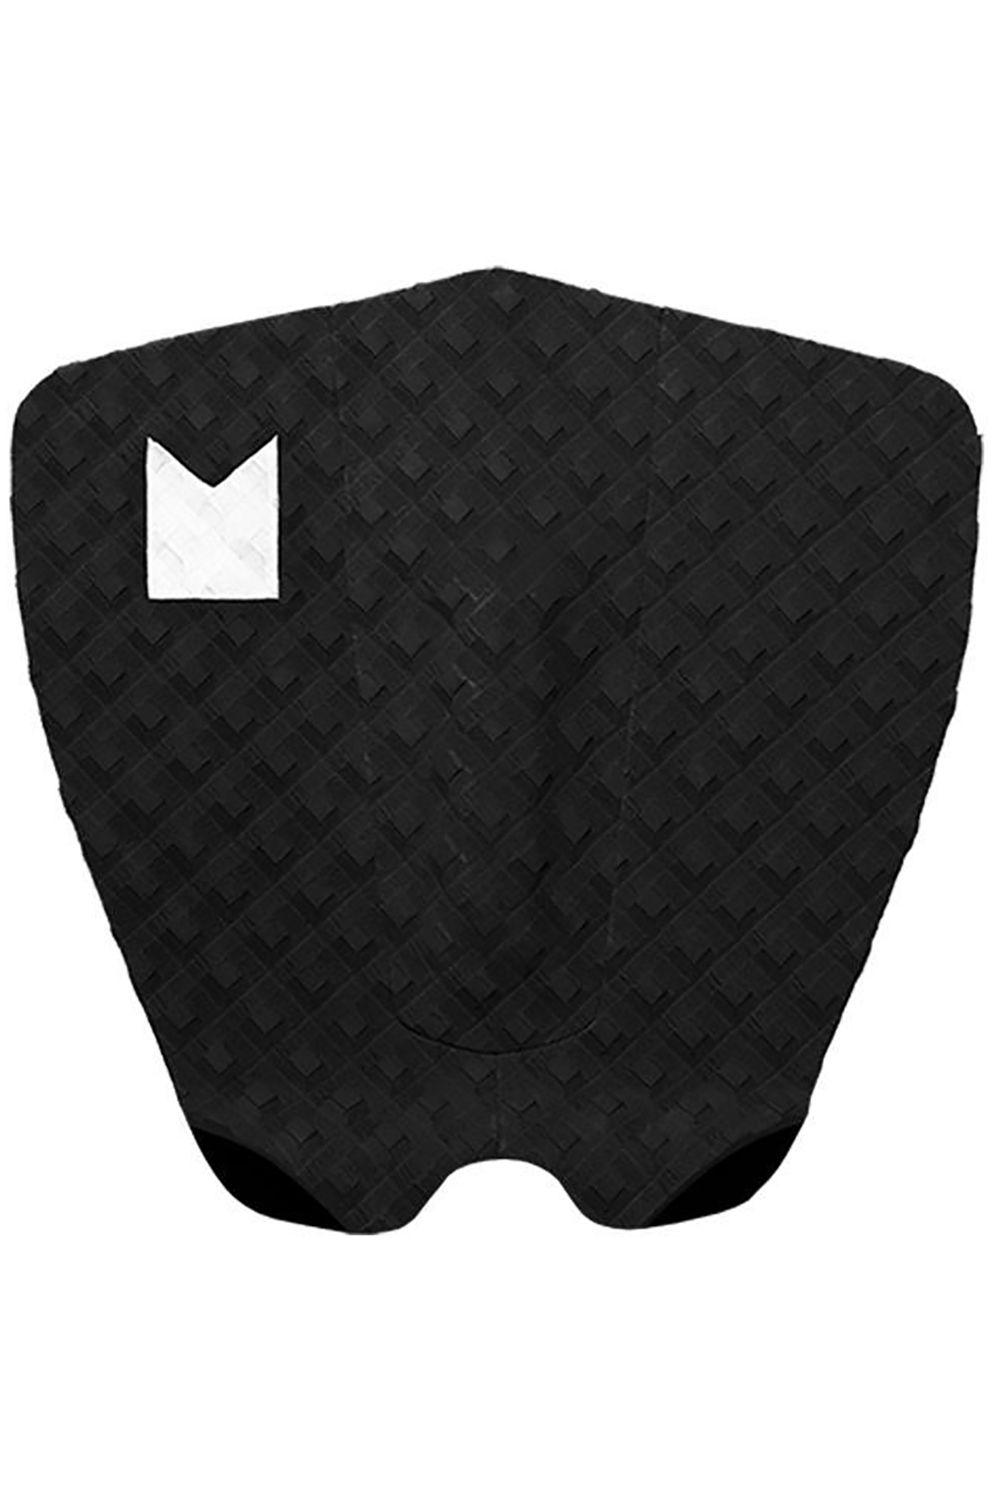 Deck Modom BLACKNESS 111 Black